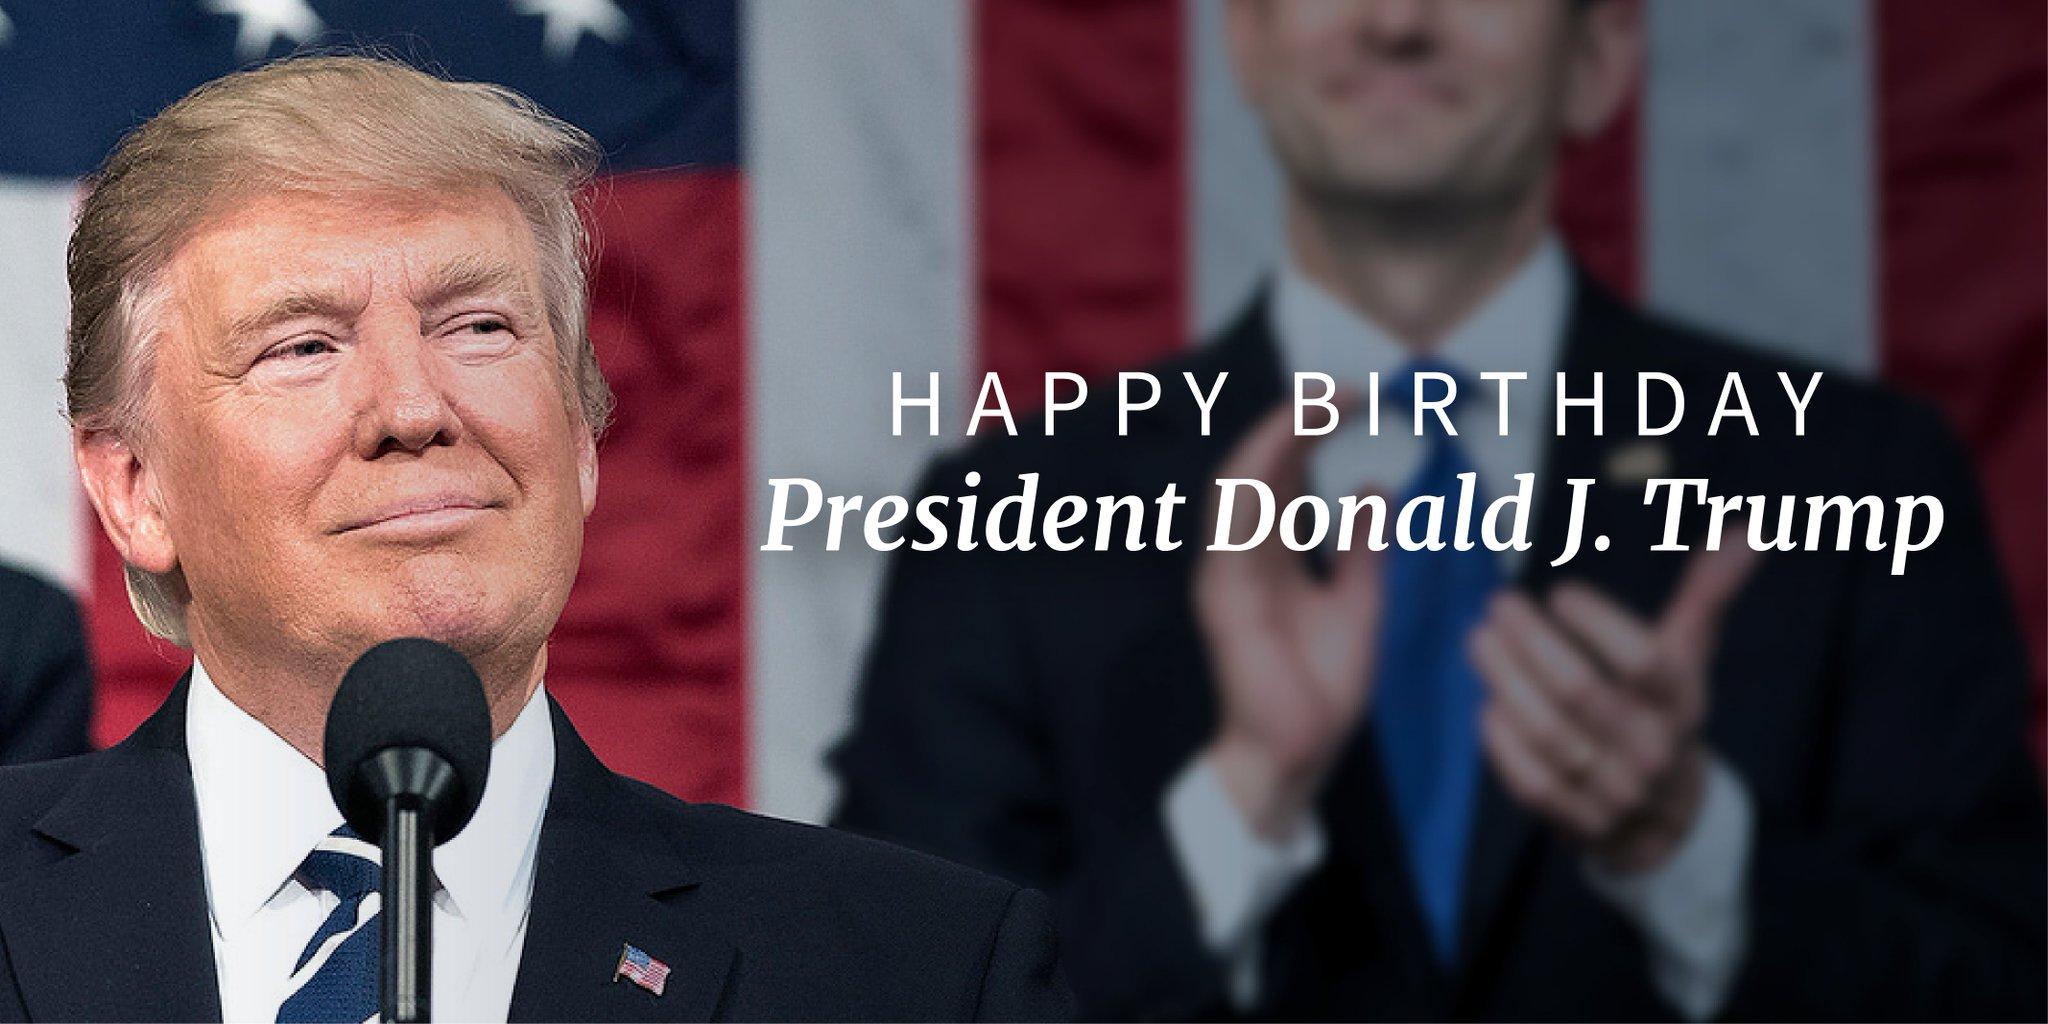 Happy birthday, @realDonaldTrump! https://t.co/e5fhi540T9